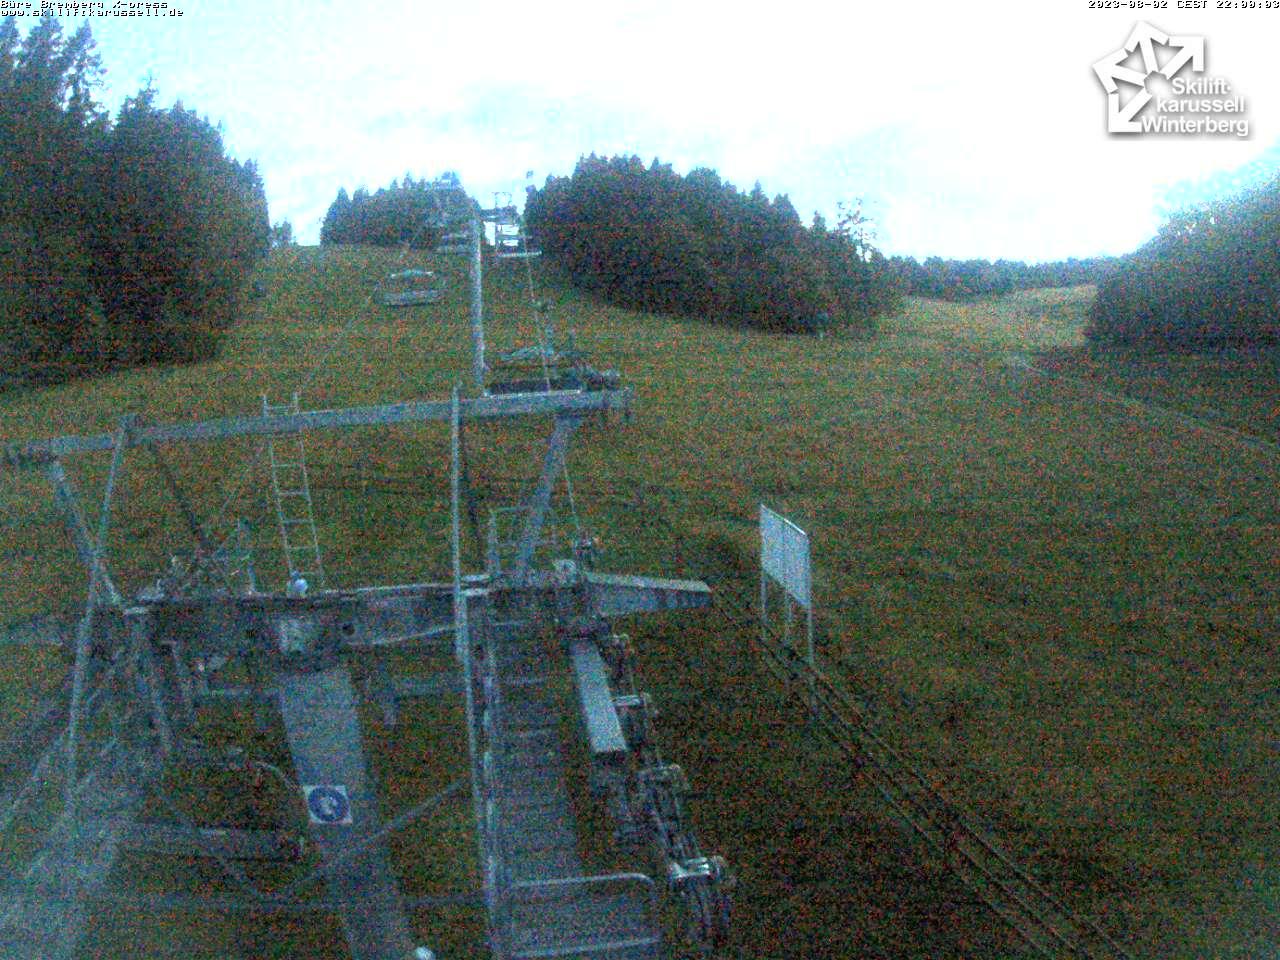 Skiliftkarussell Winterberg - Webcam 6